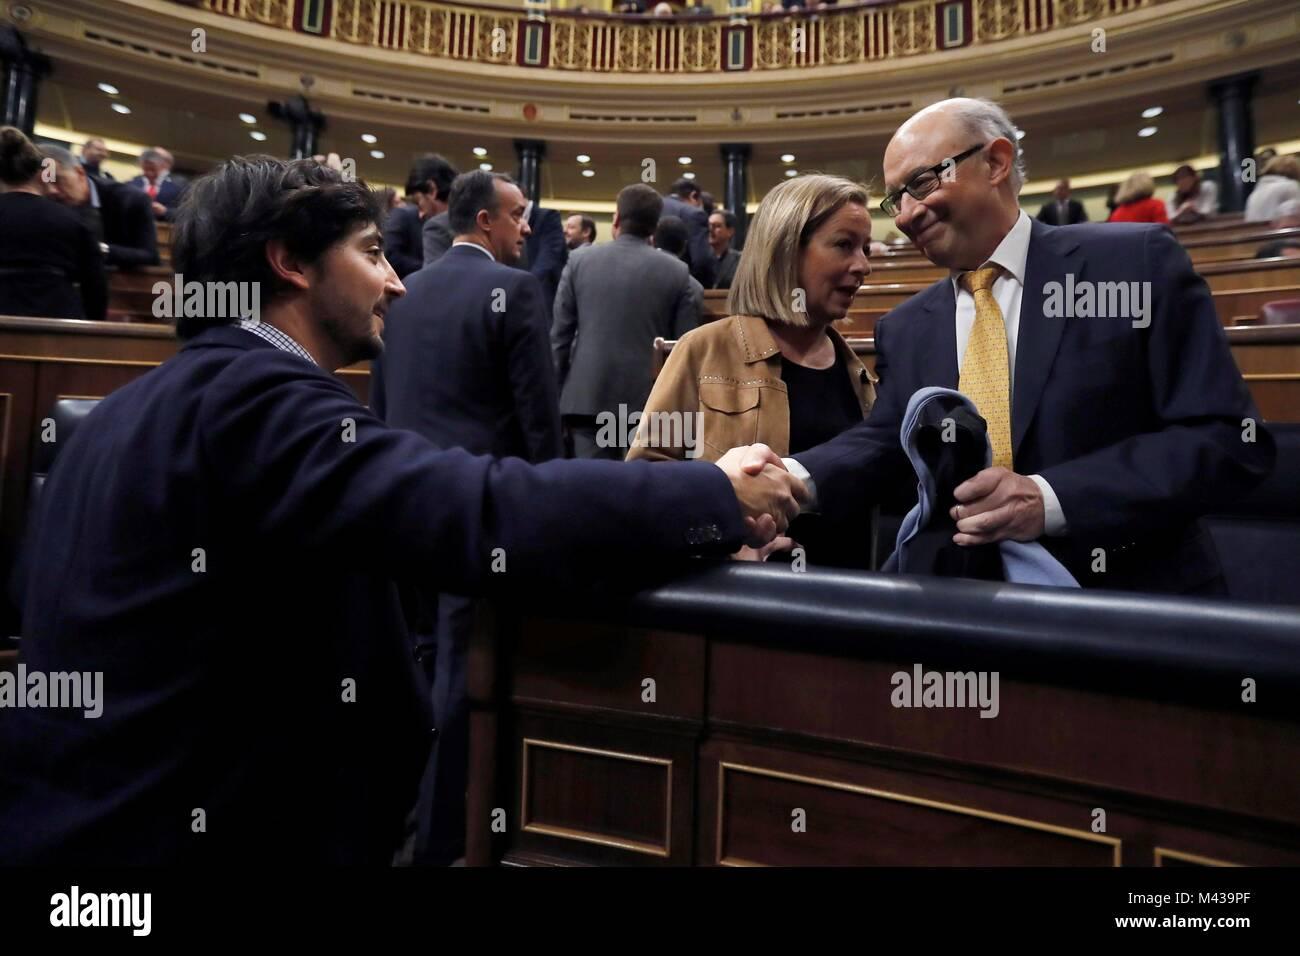 Madrid, Spain. 14th Feb, 2018. Spanish Treasure Minister, Cristobal Montoro (R), shakes hands with Ciudadanos party's - Stock Image